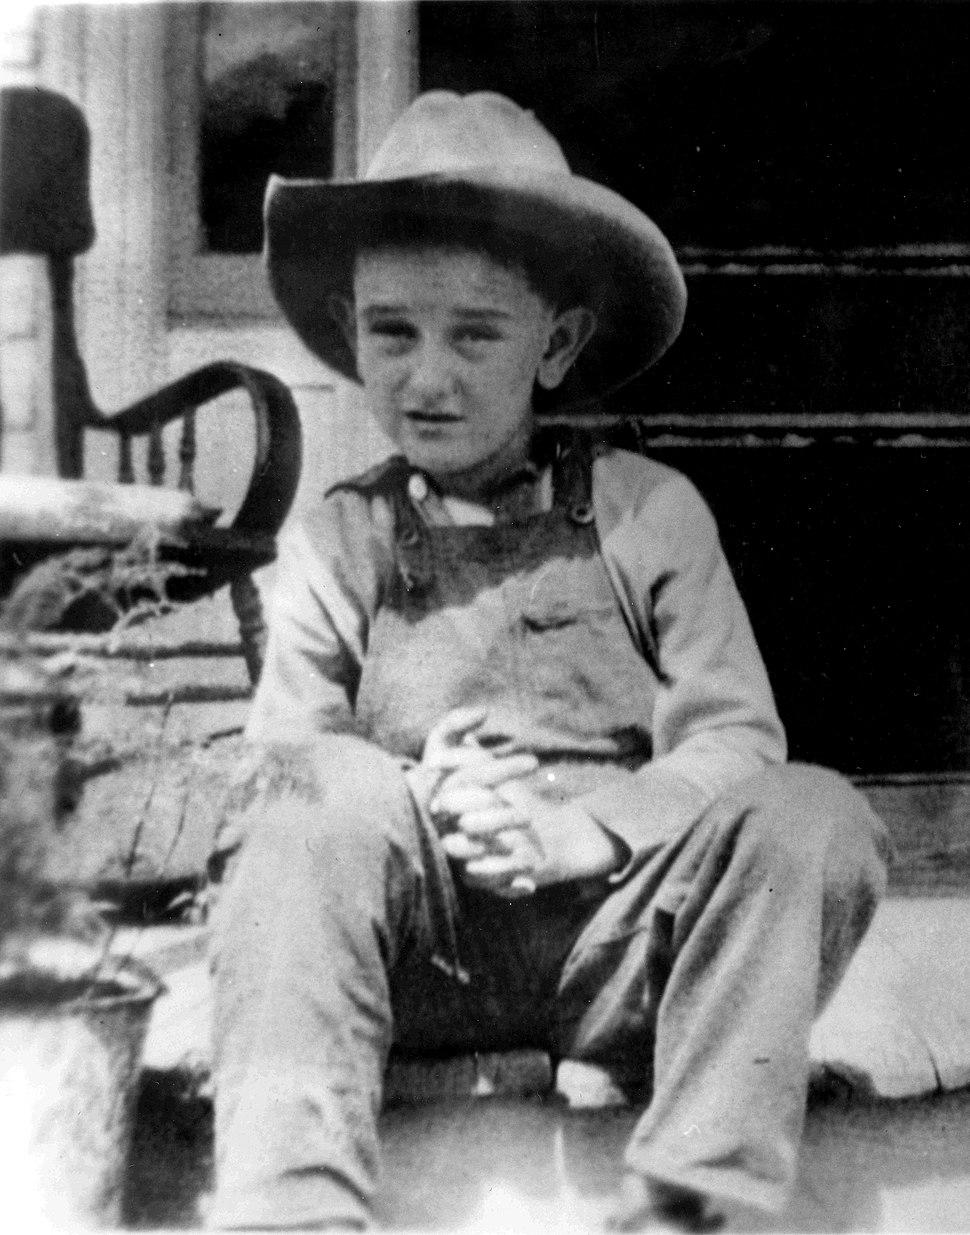 Lyndon B. Johnson - 15-13-2 - ca. 1915